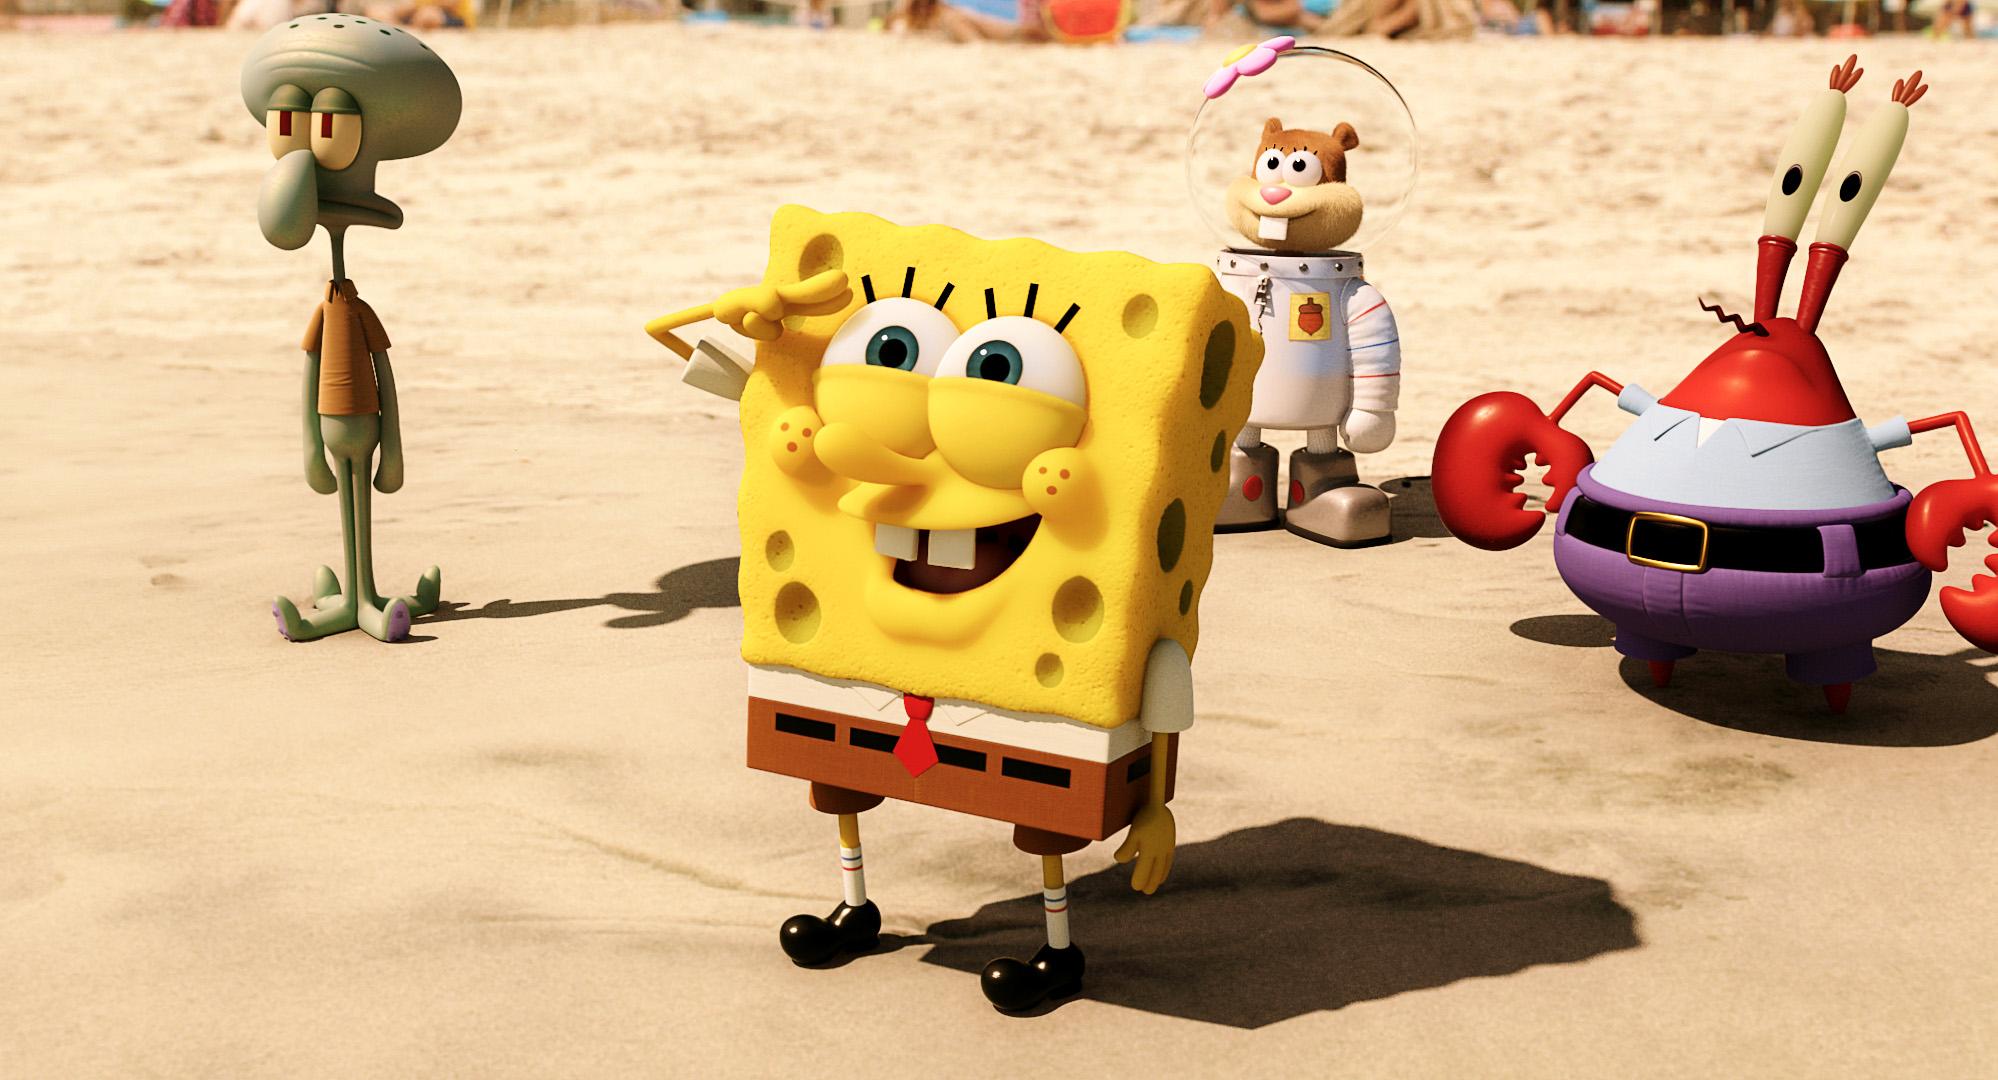 spongebob squarepants videos at abc news video archive at abcnews com